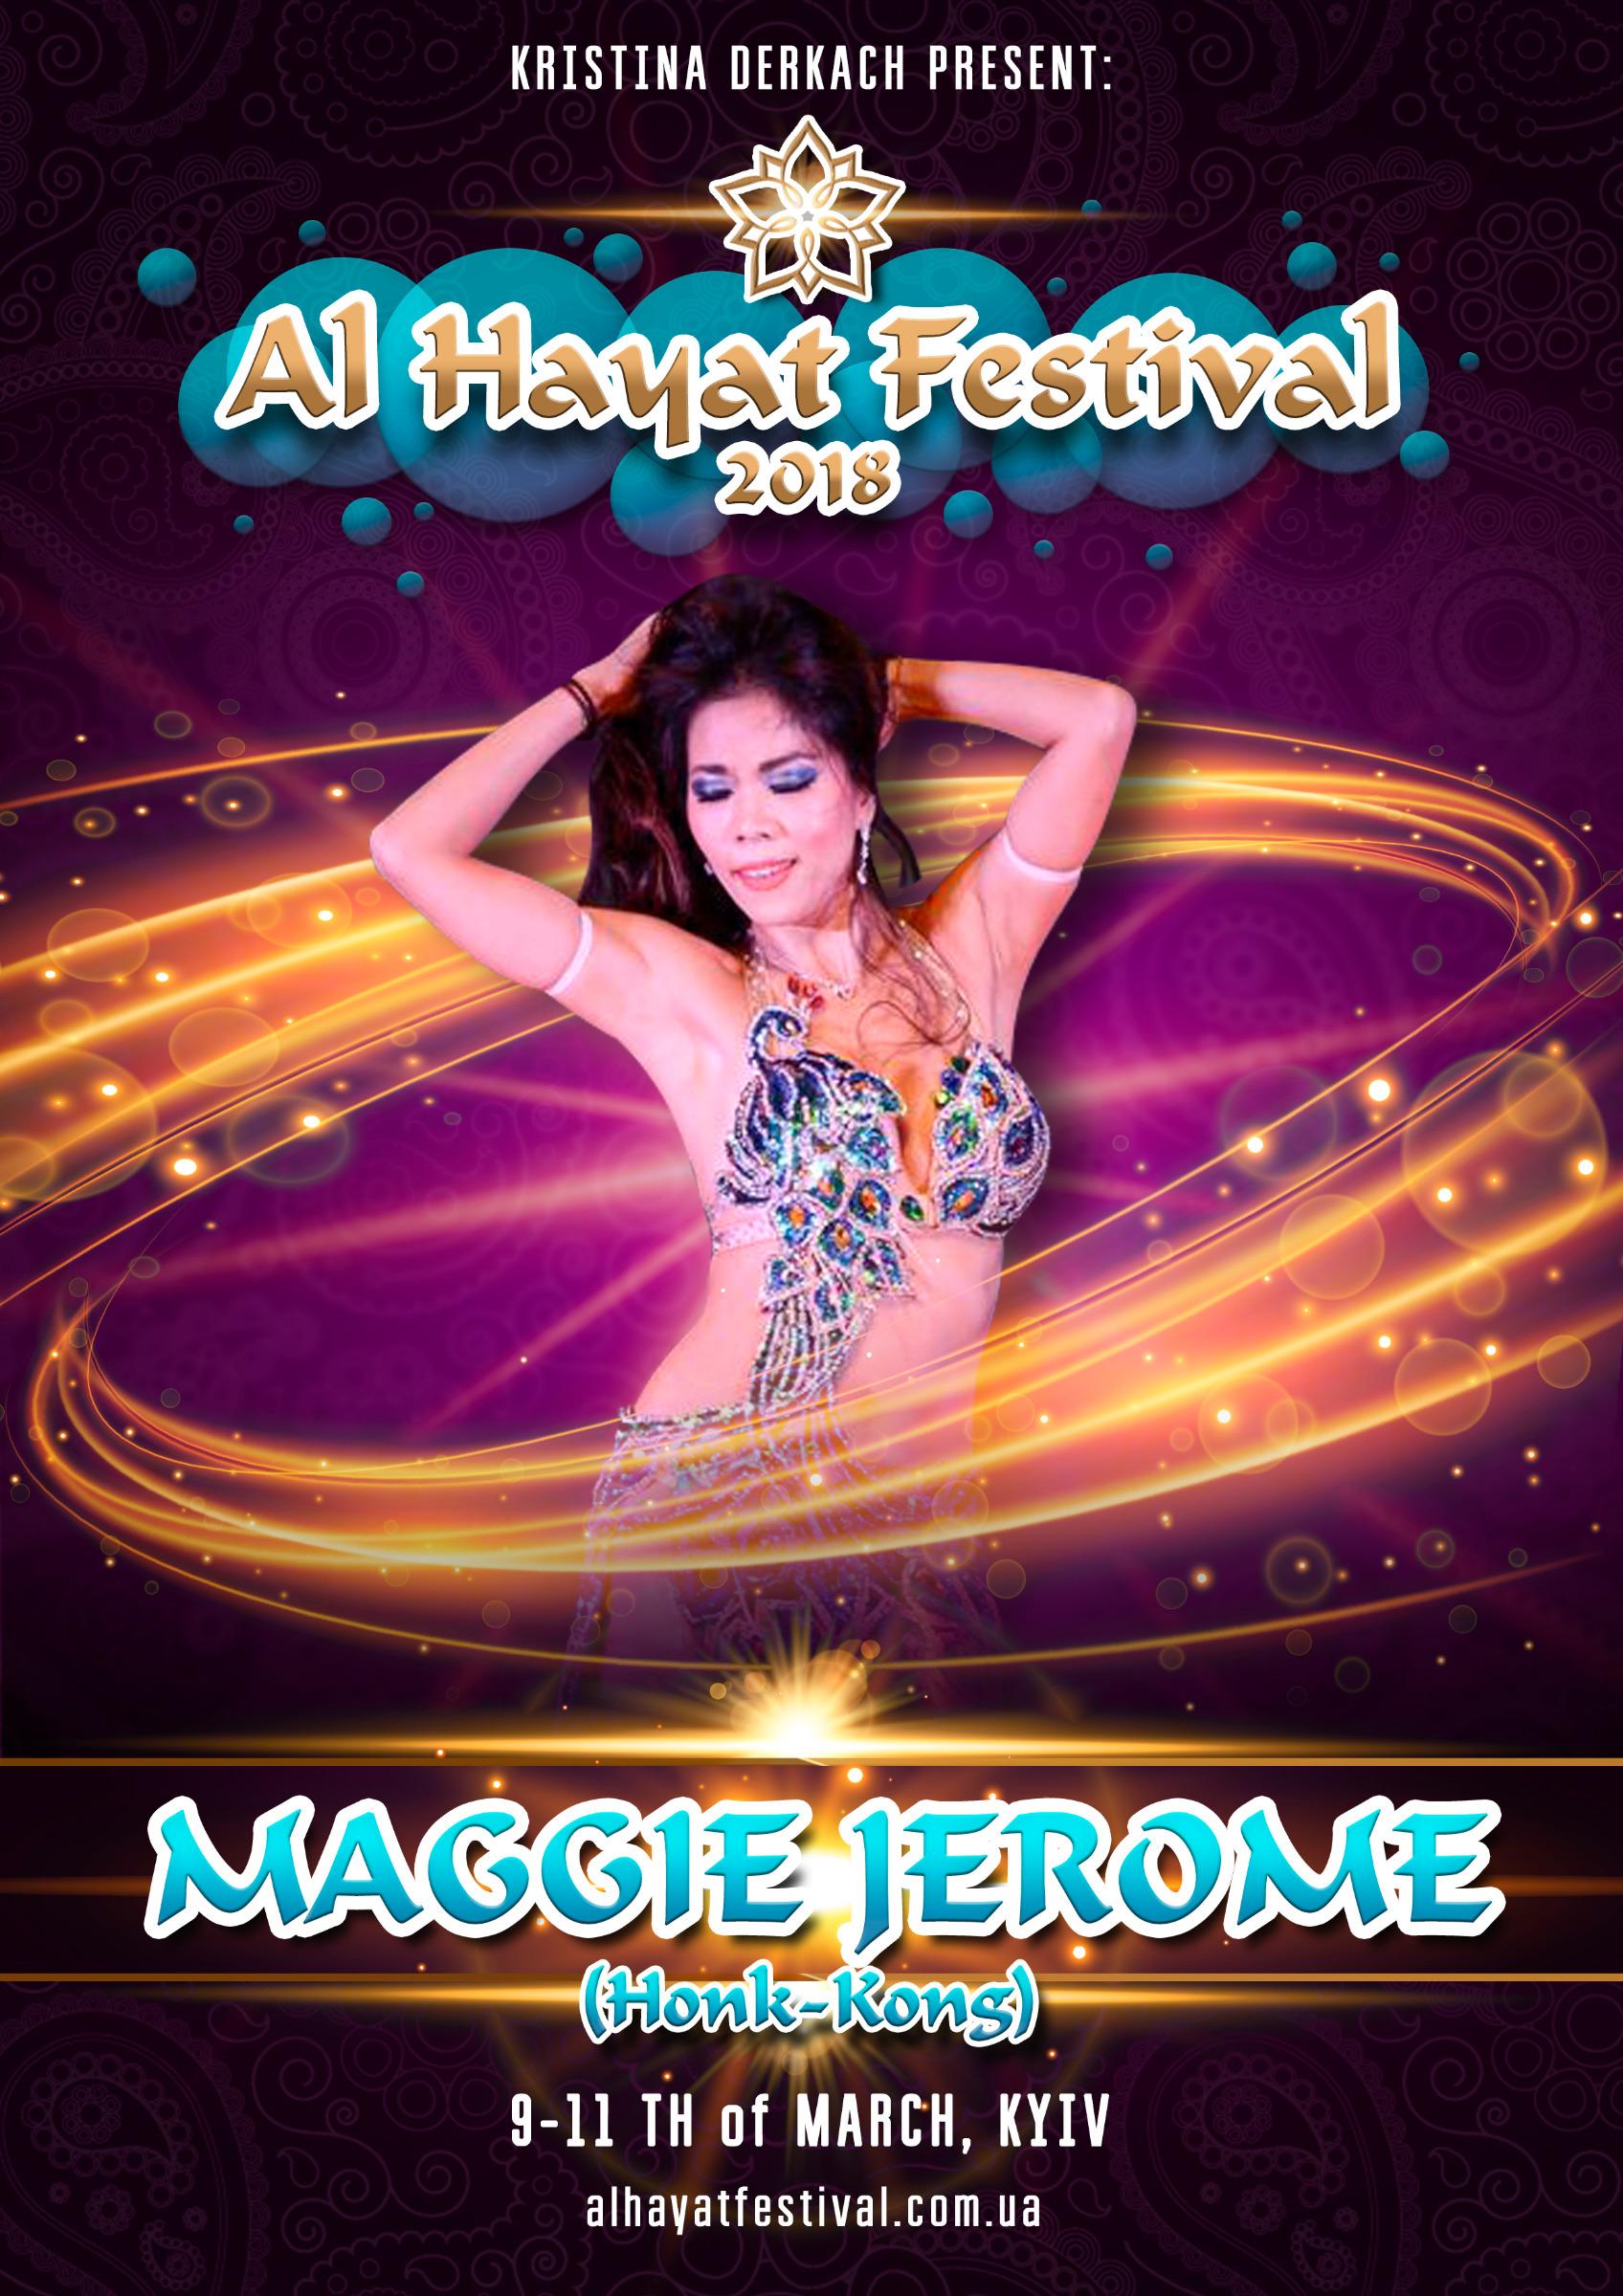 MaggieJerome_2017-08-19-2.jpg